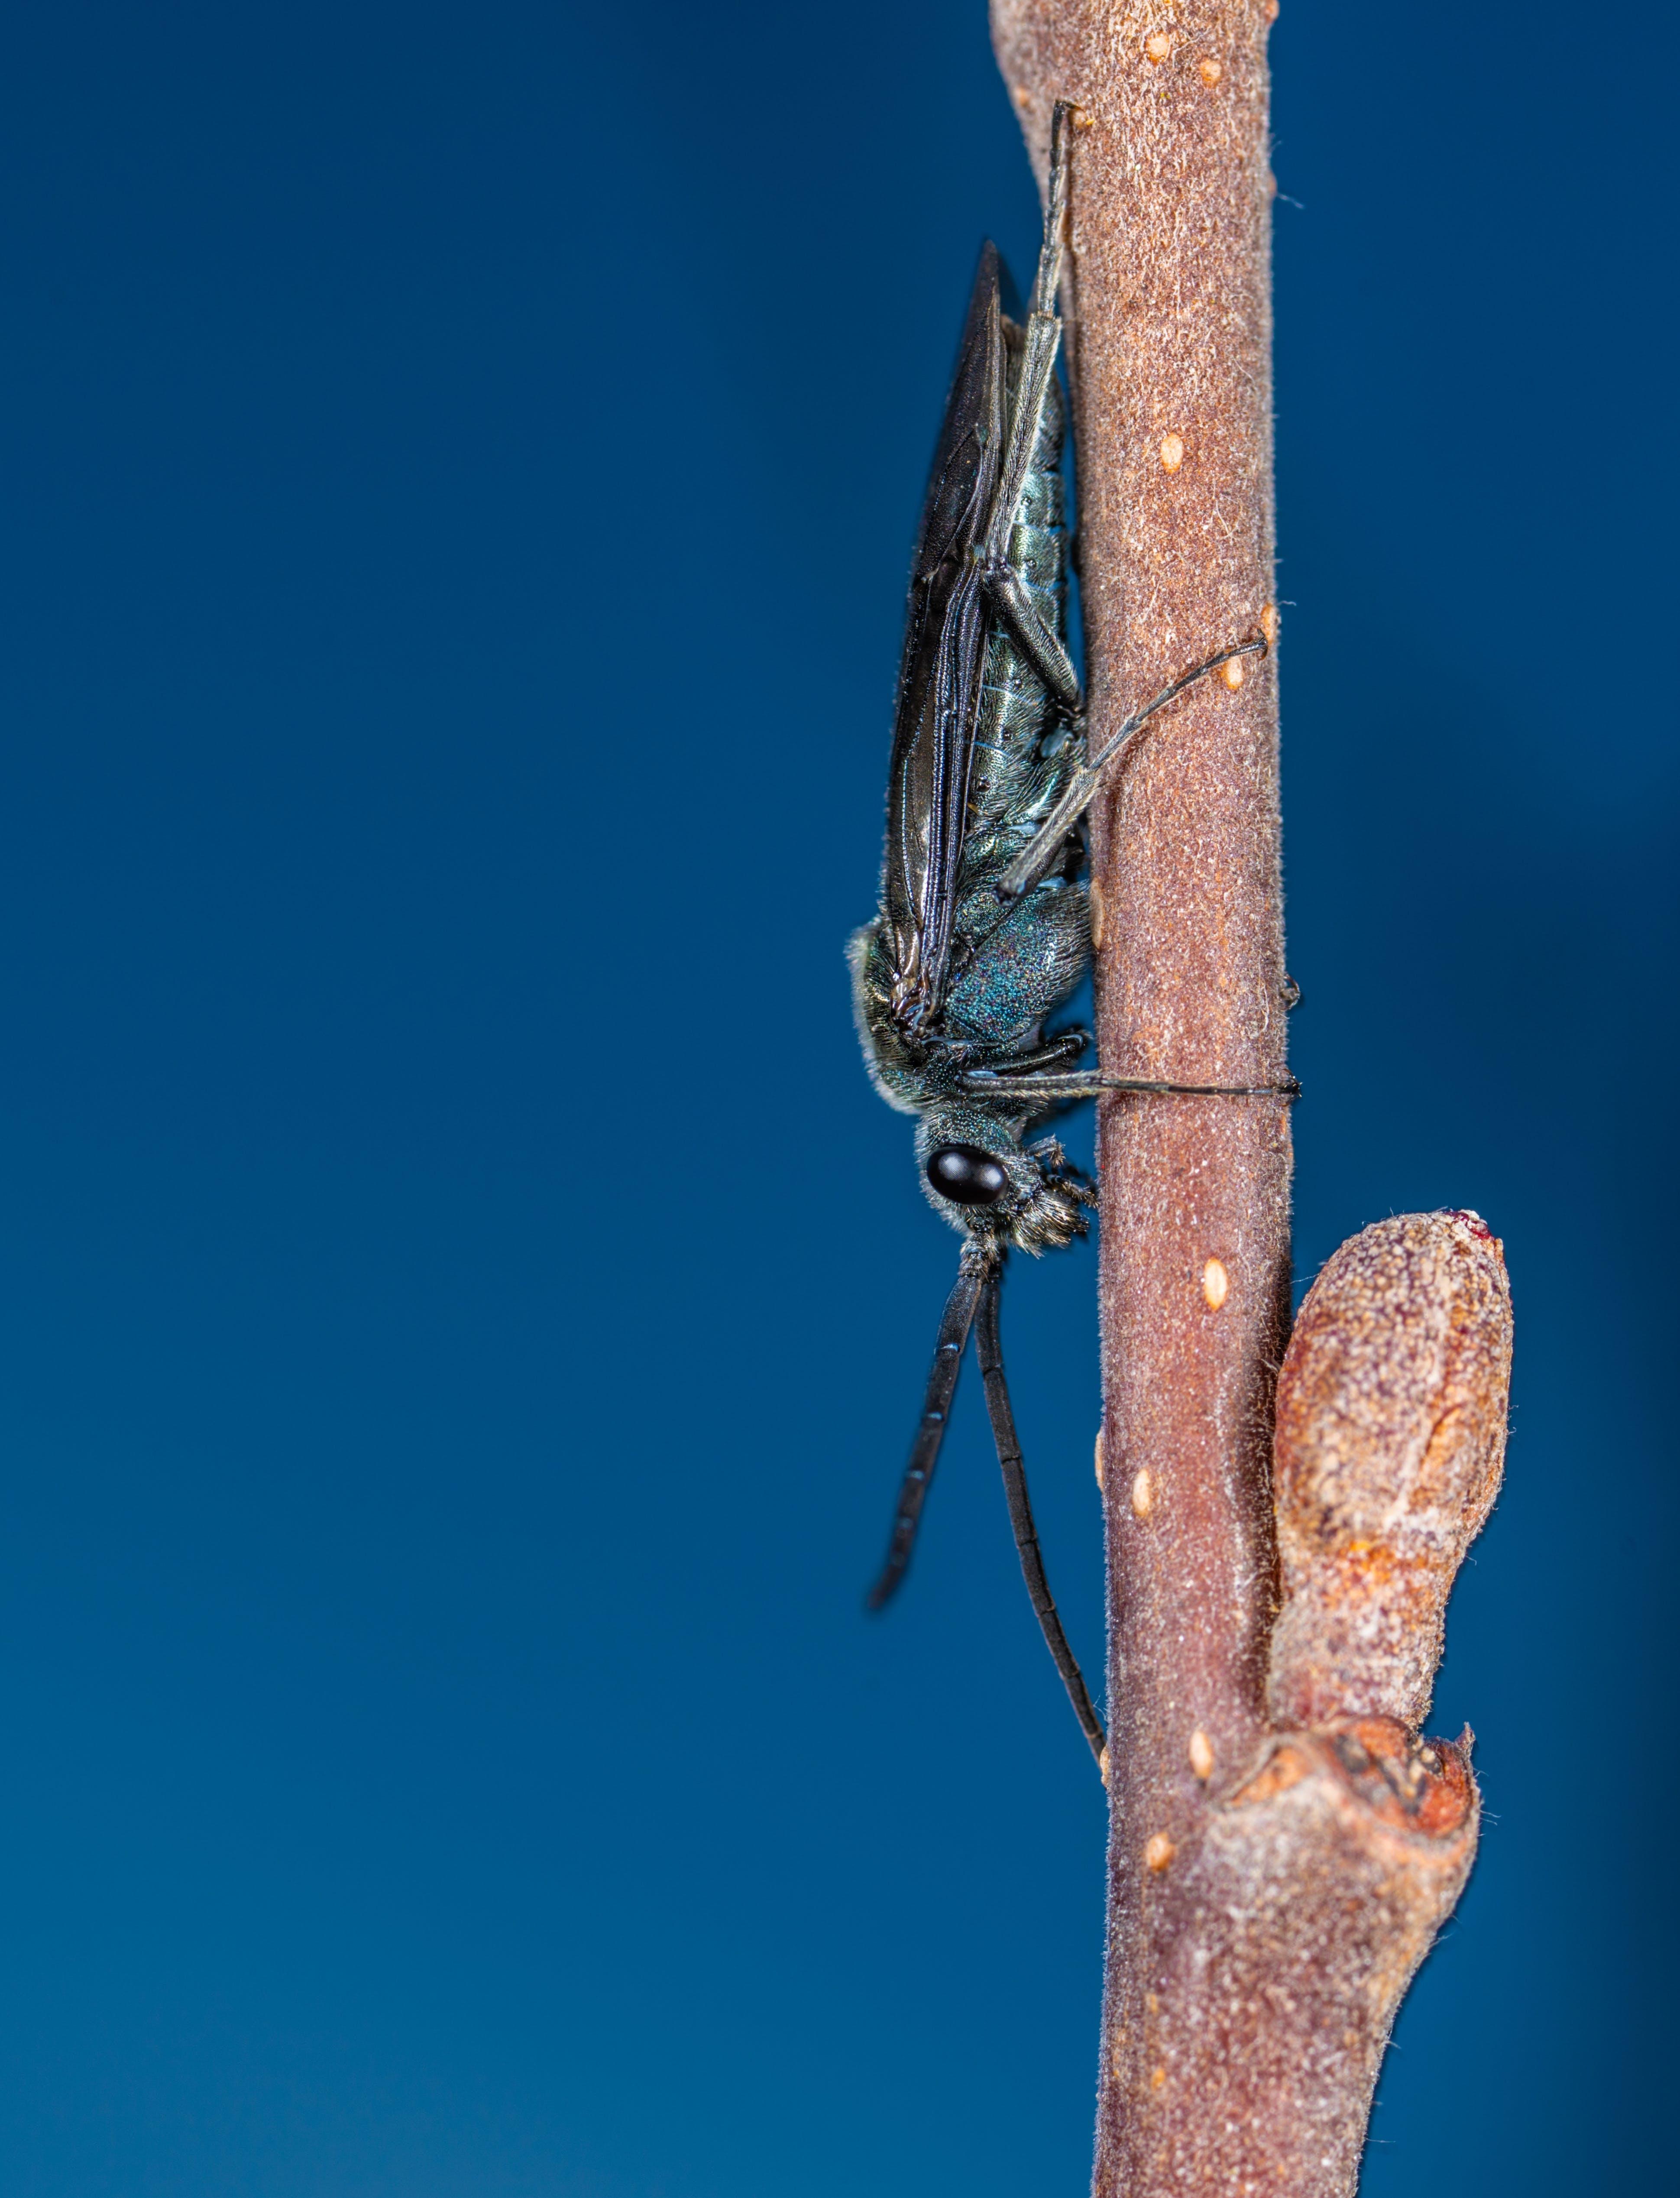 Kostenloses Stock Foto zu biologie, fokus, insekt, makro